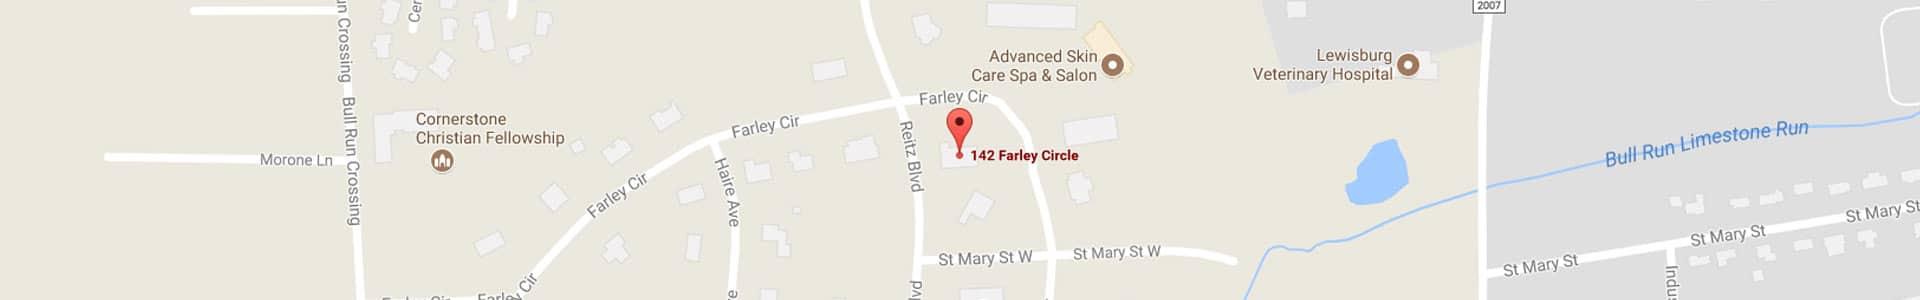 Footer Map Hover Albert Stush Jr DMD in Lewisburg PA